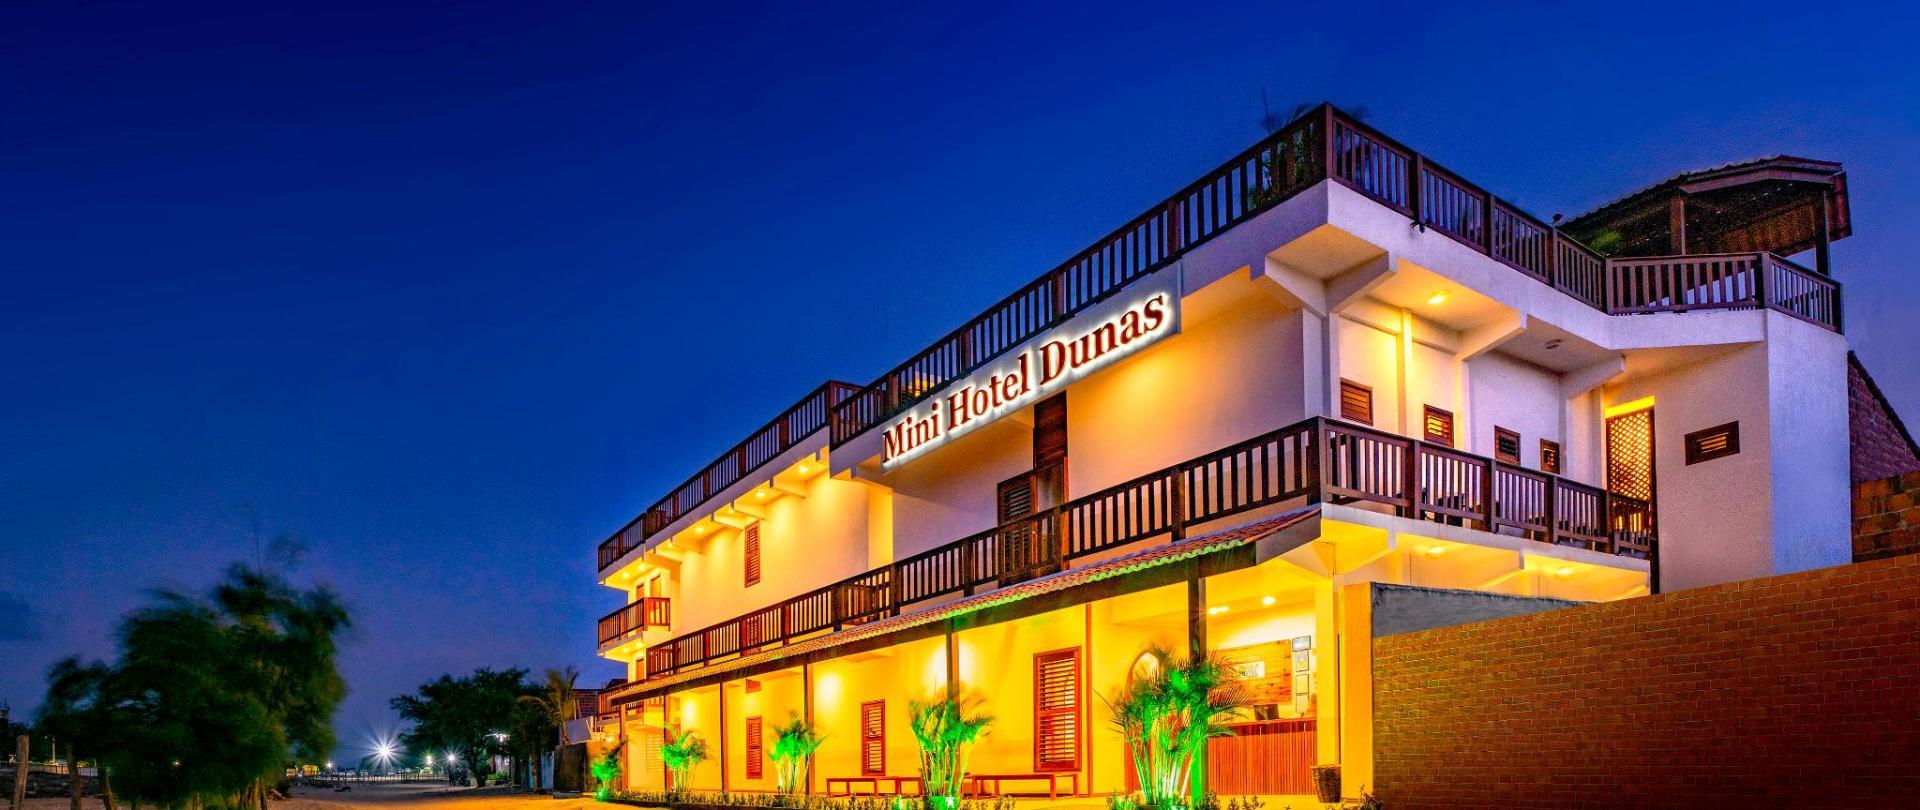 mini_hotel_dunas_001_fachada_b.jpg